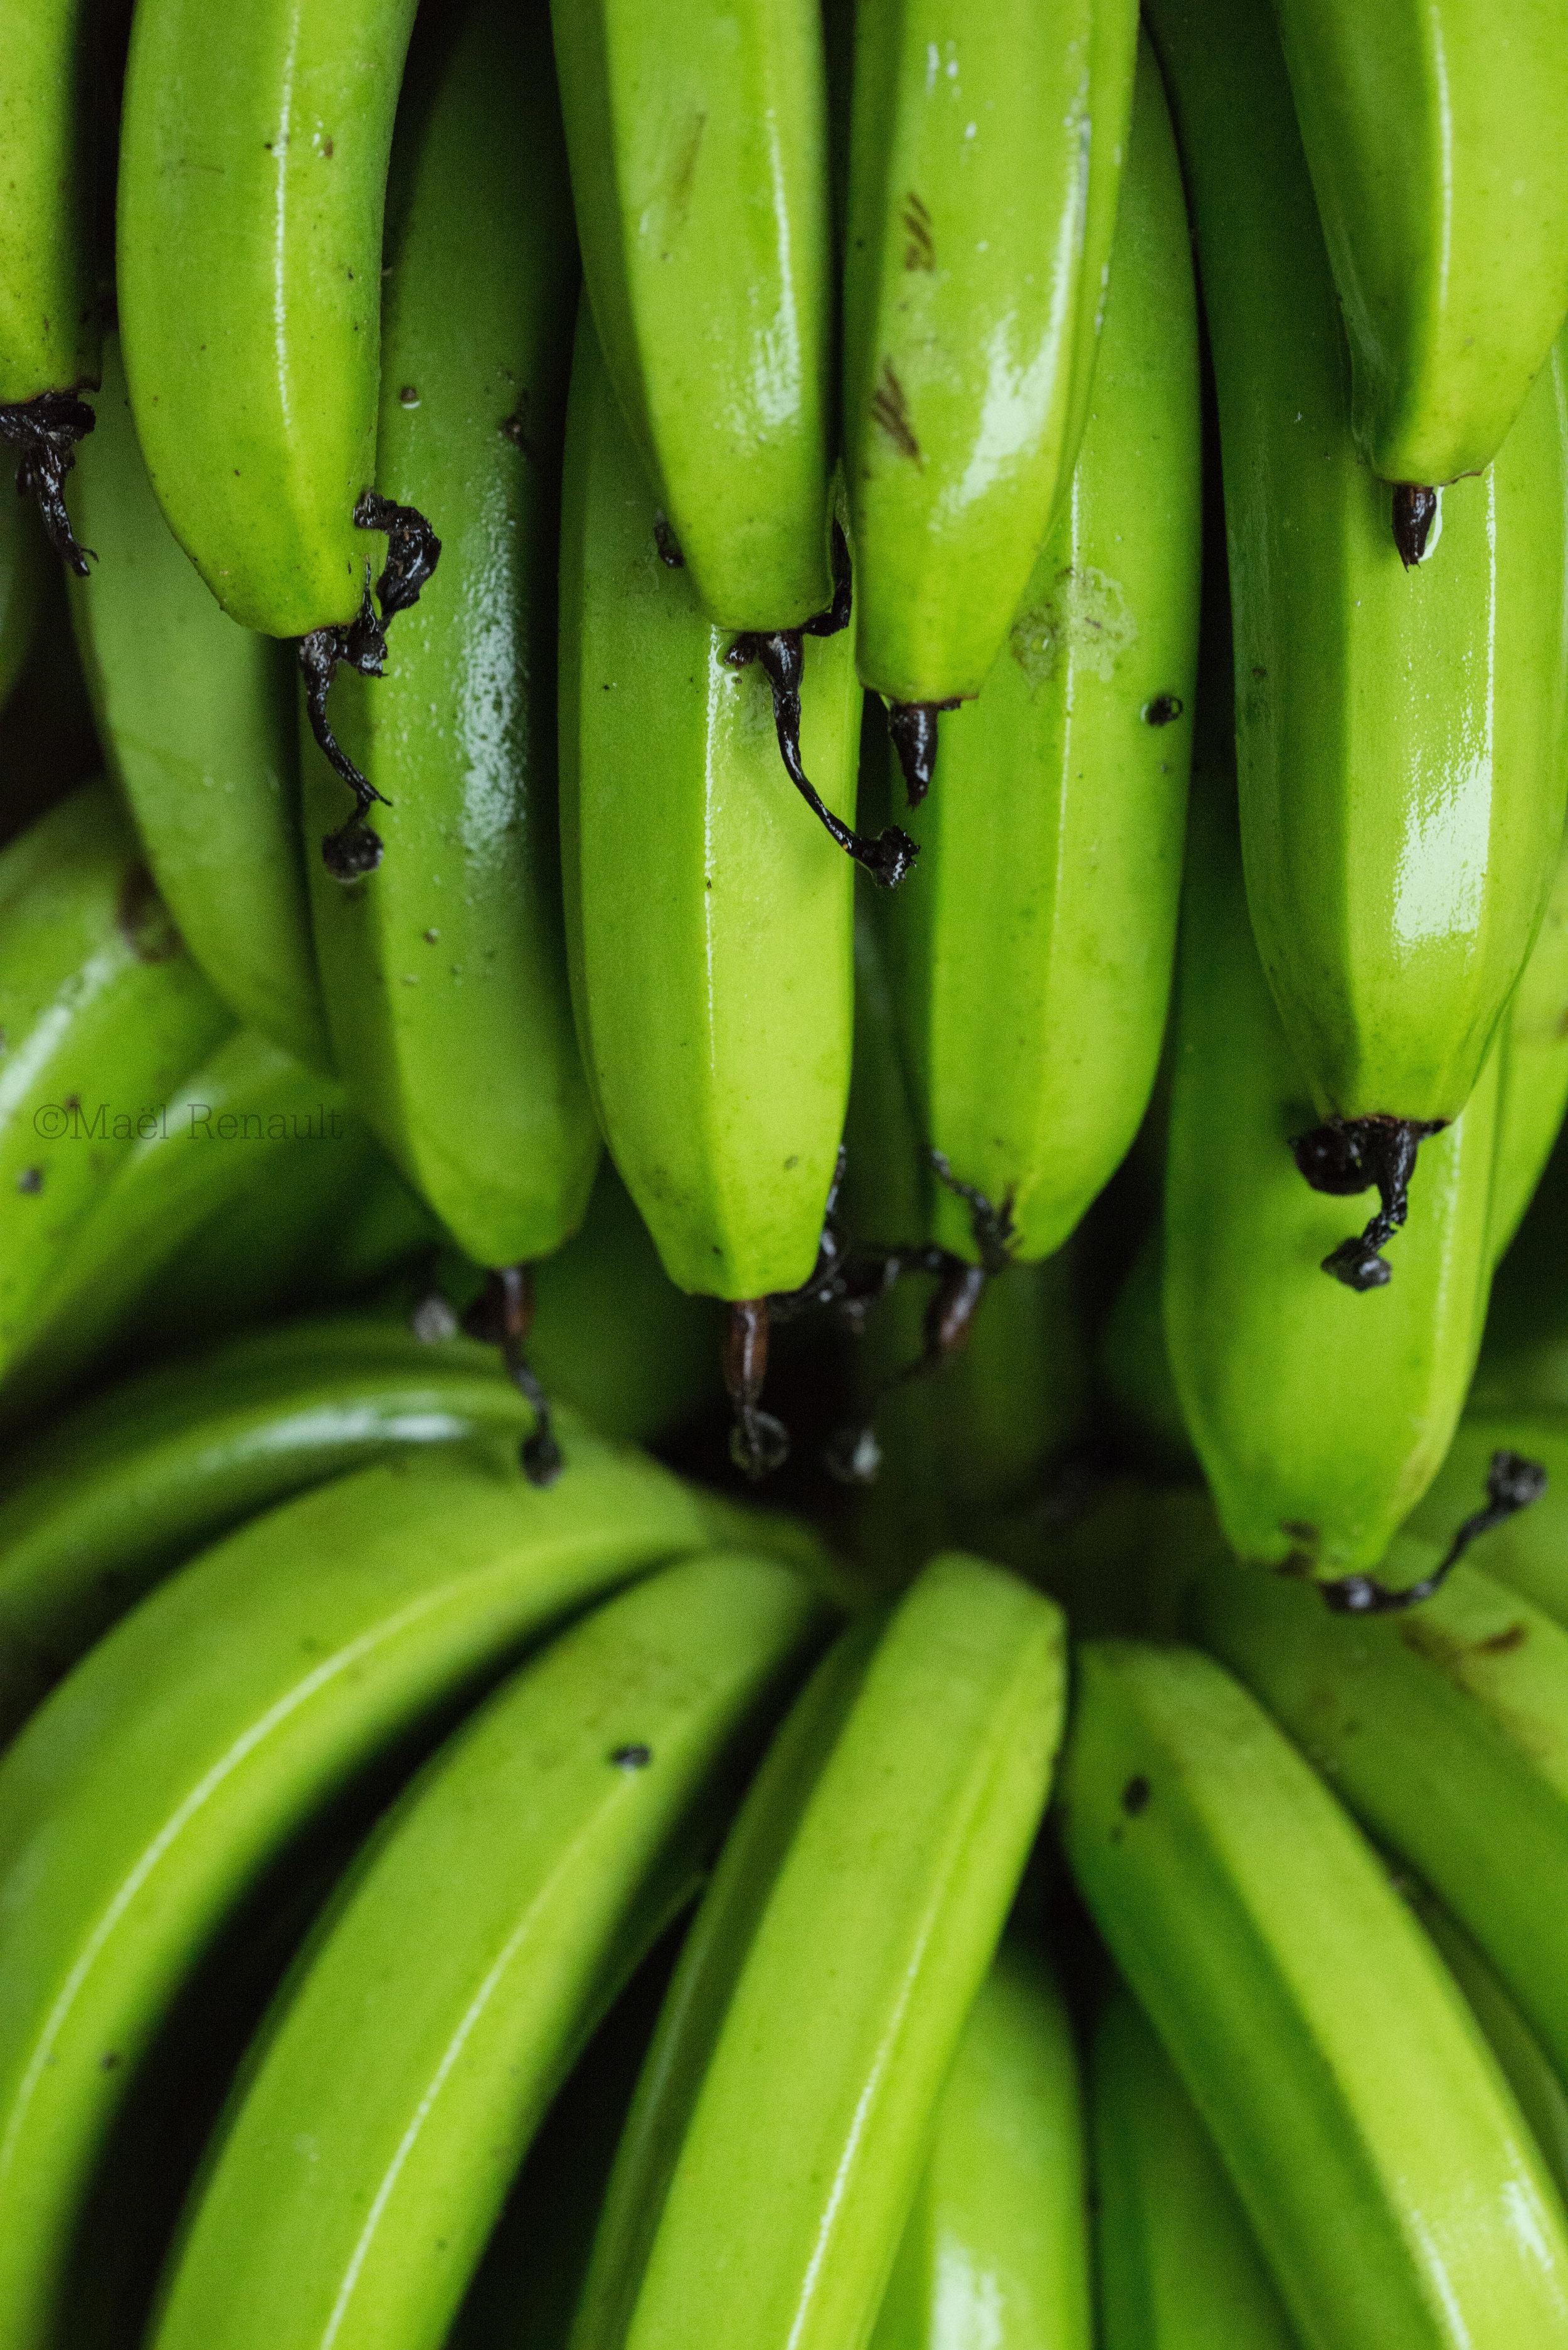 Fresh Banana / Food